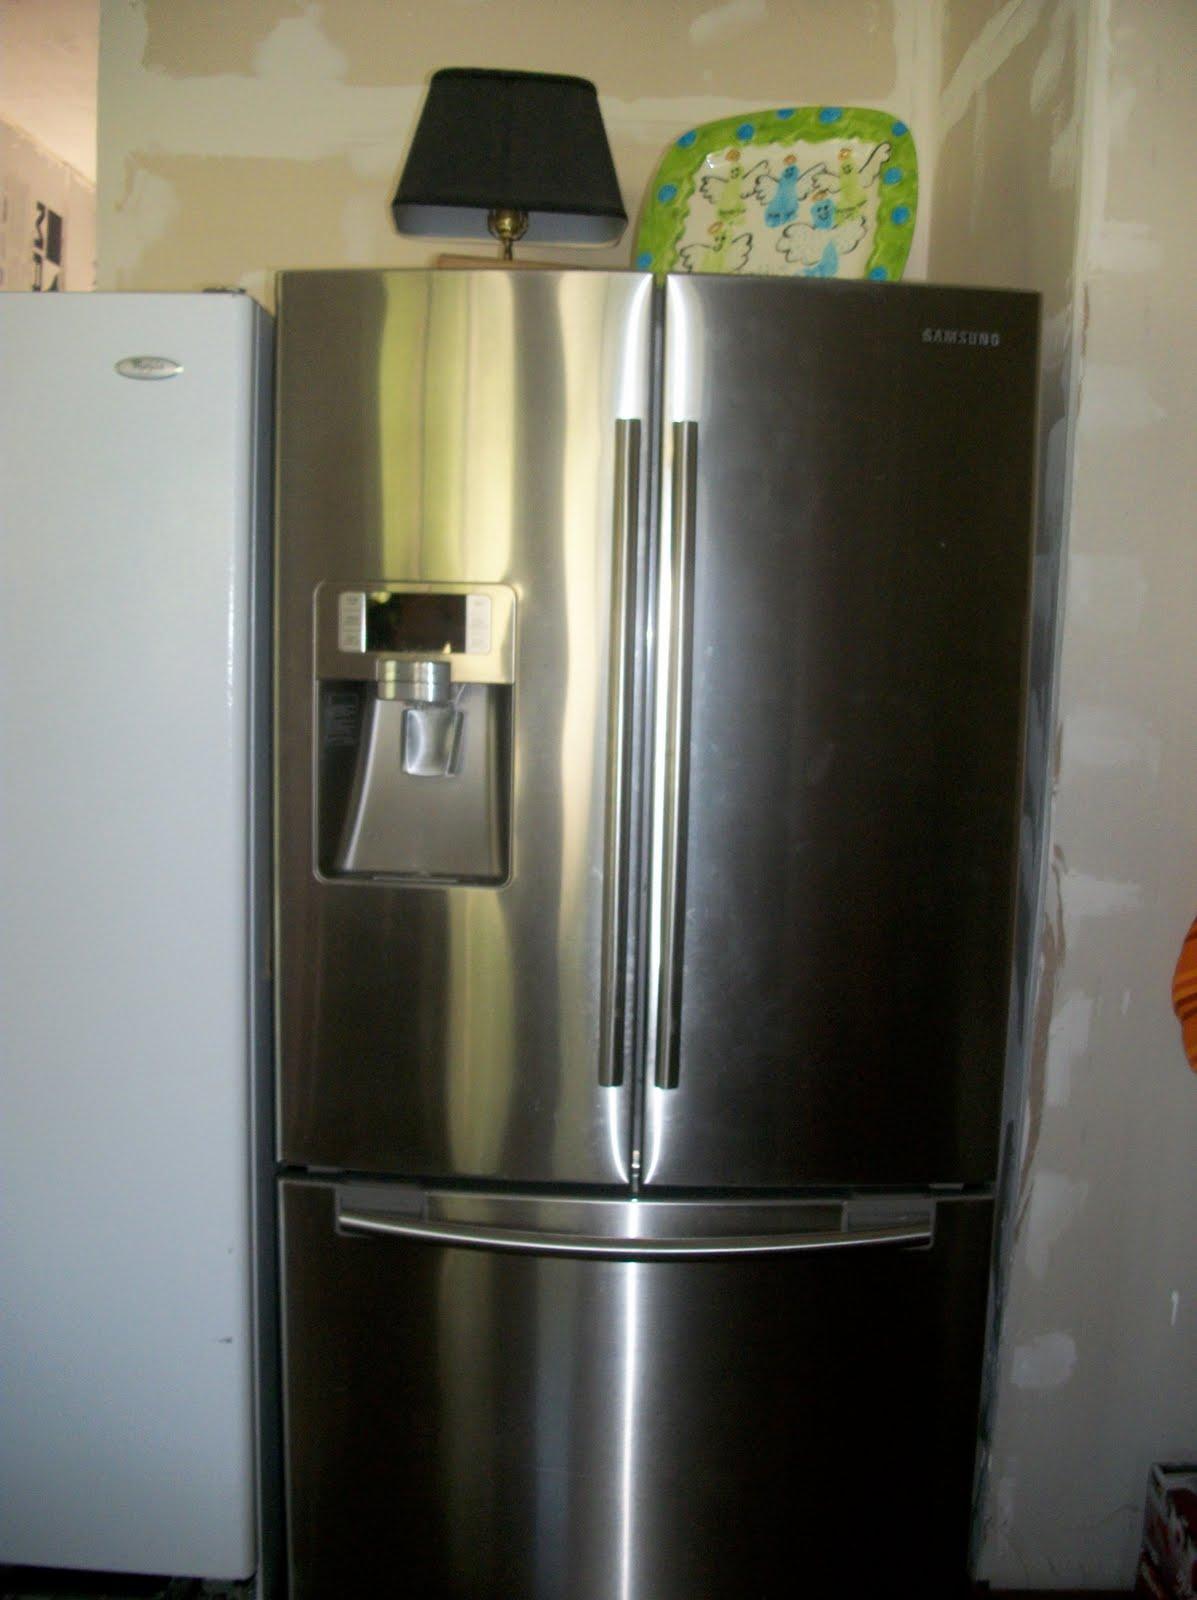 The Seagraves 7 Broken Refrigerator Round 2